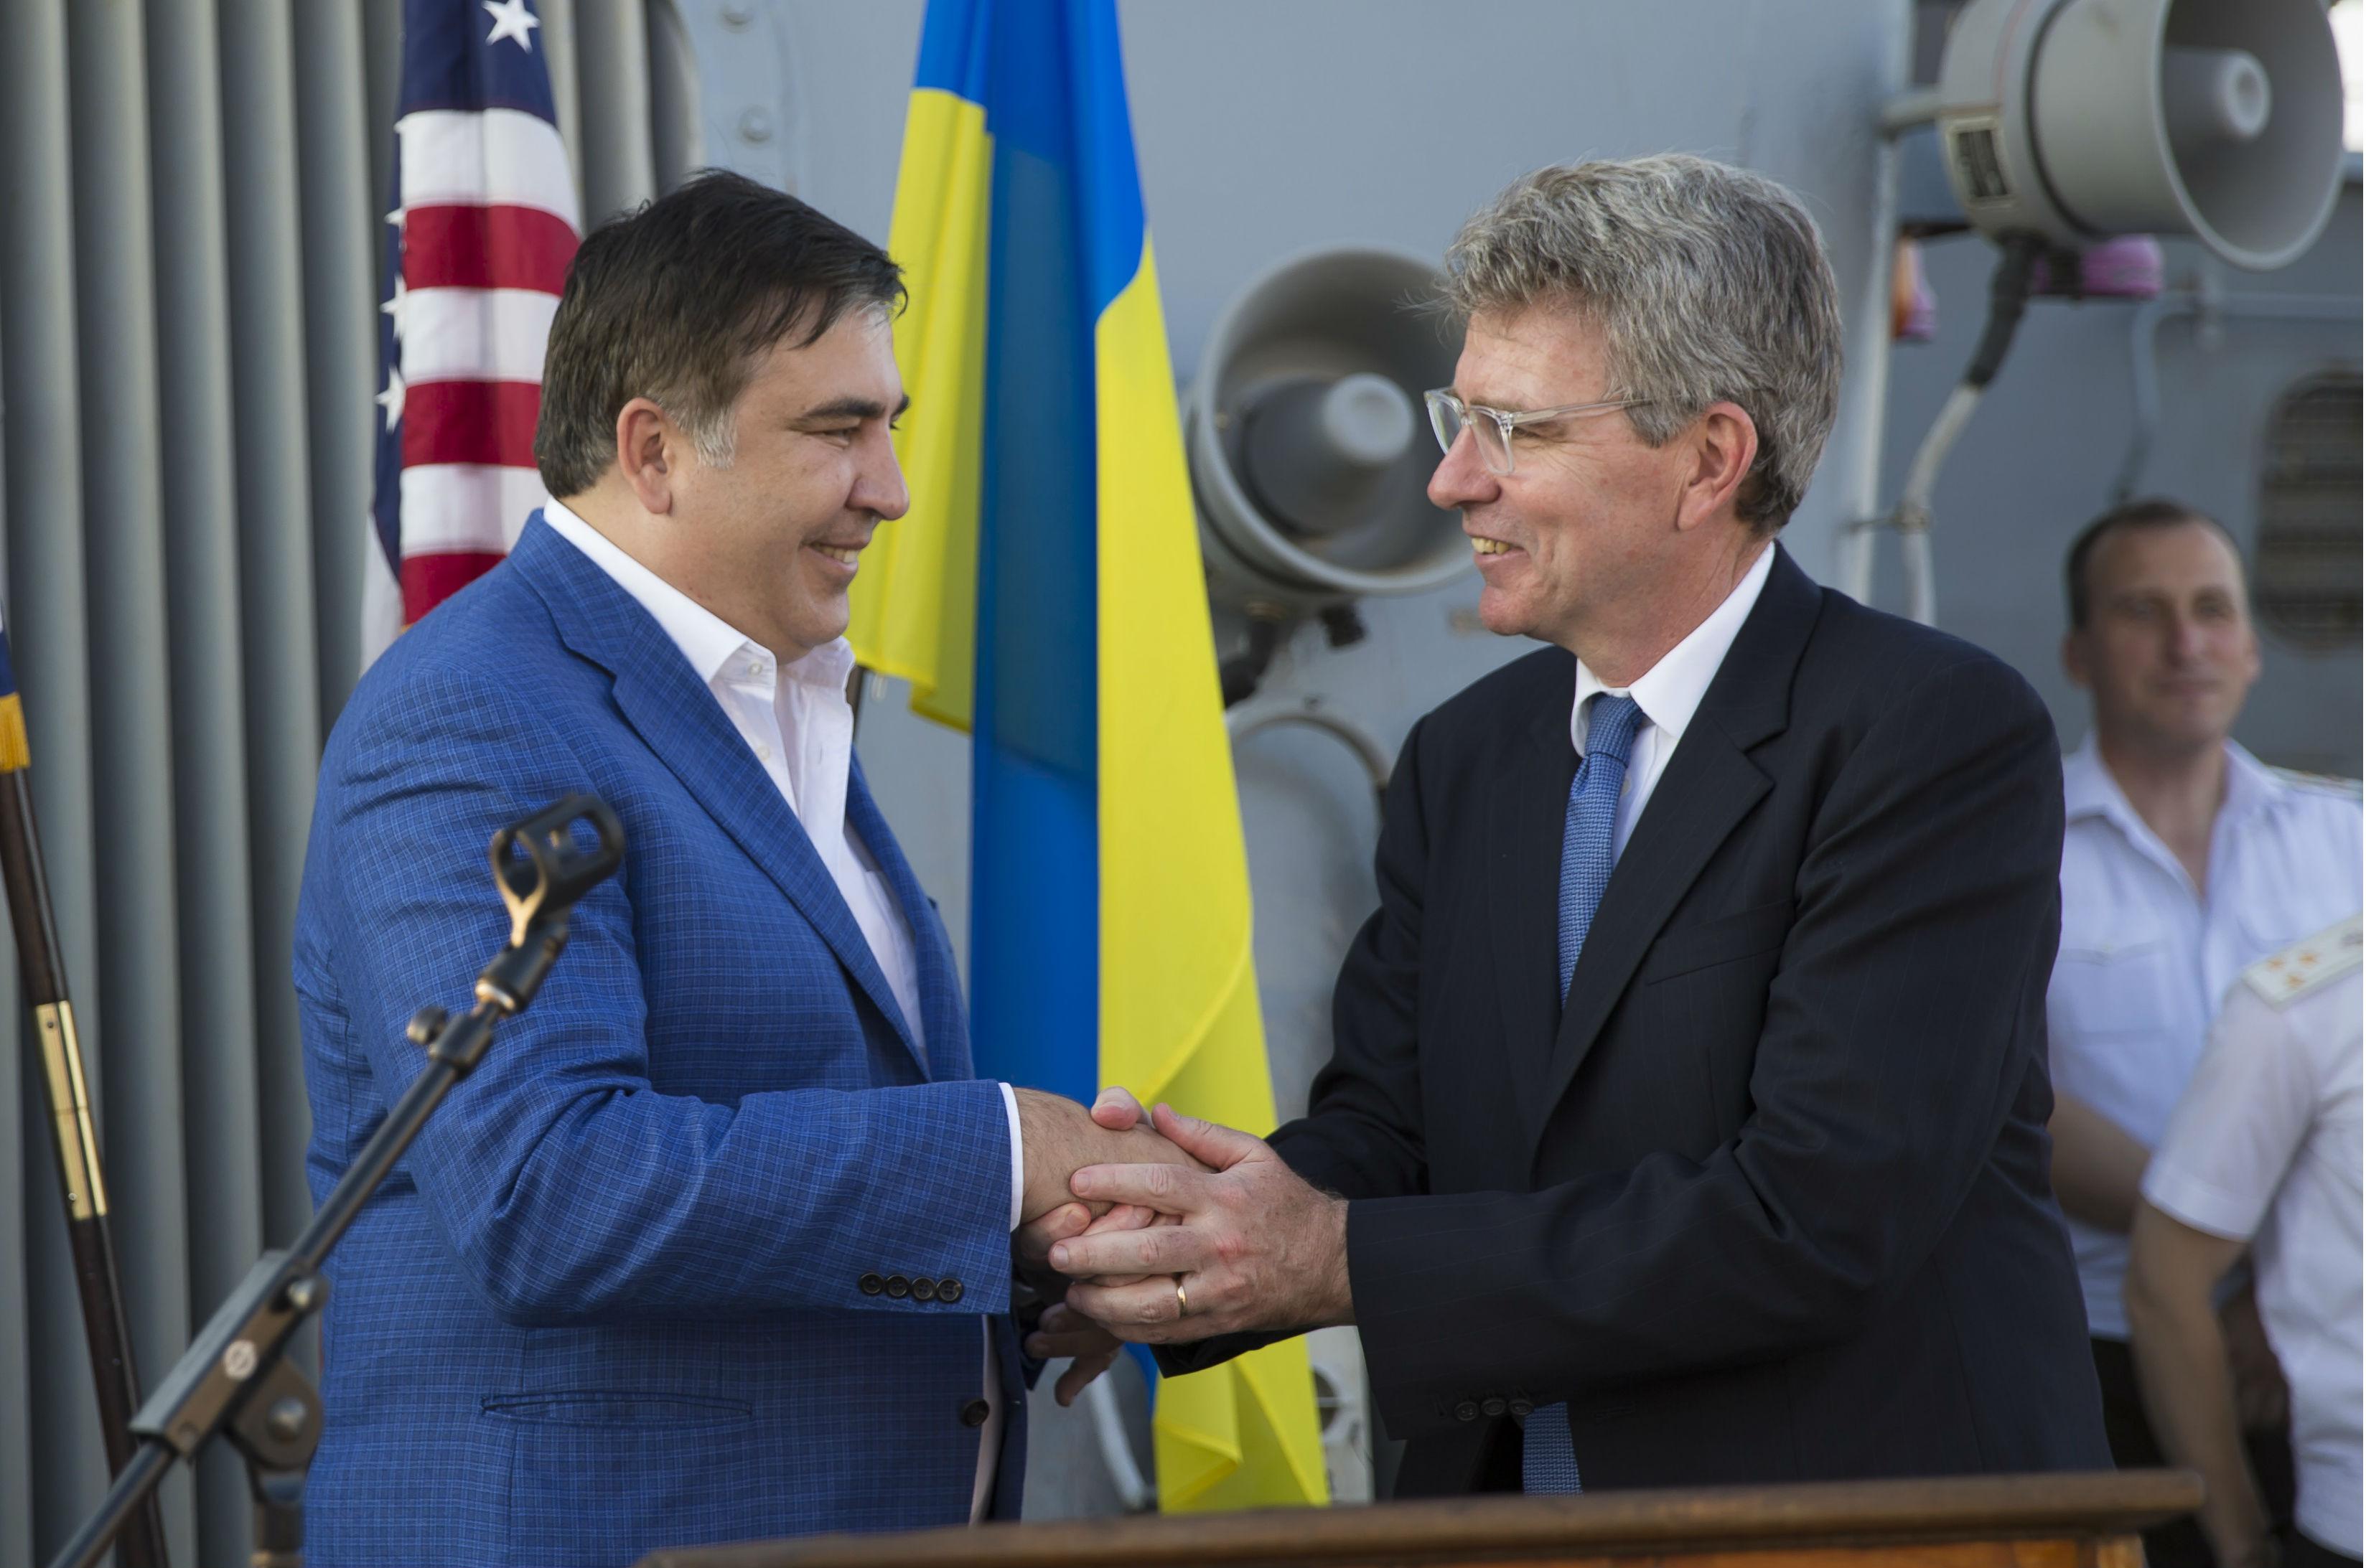 Saakashvili in Odesa: When Making Waves is Not Enough